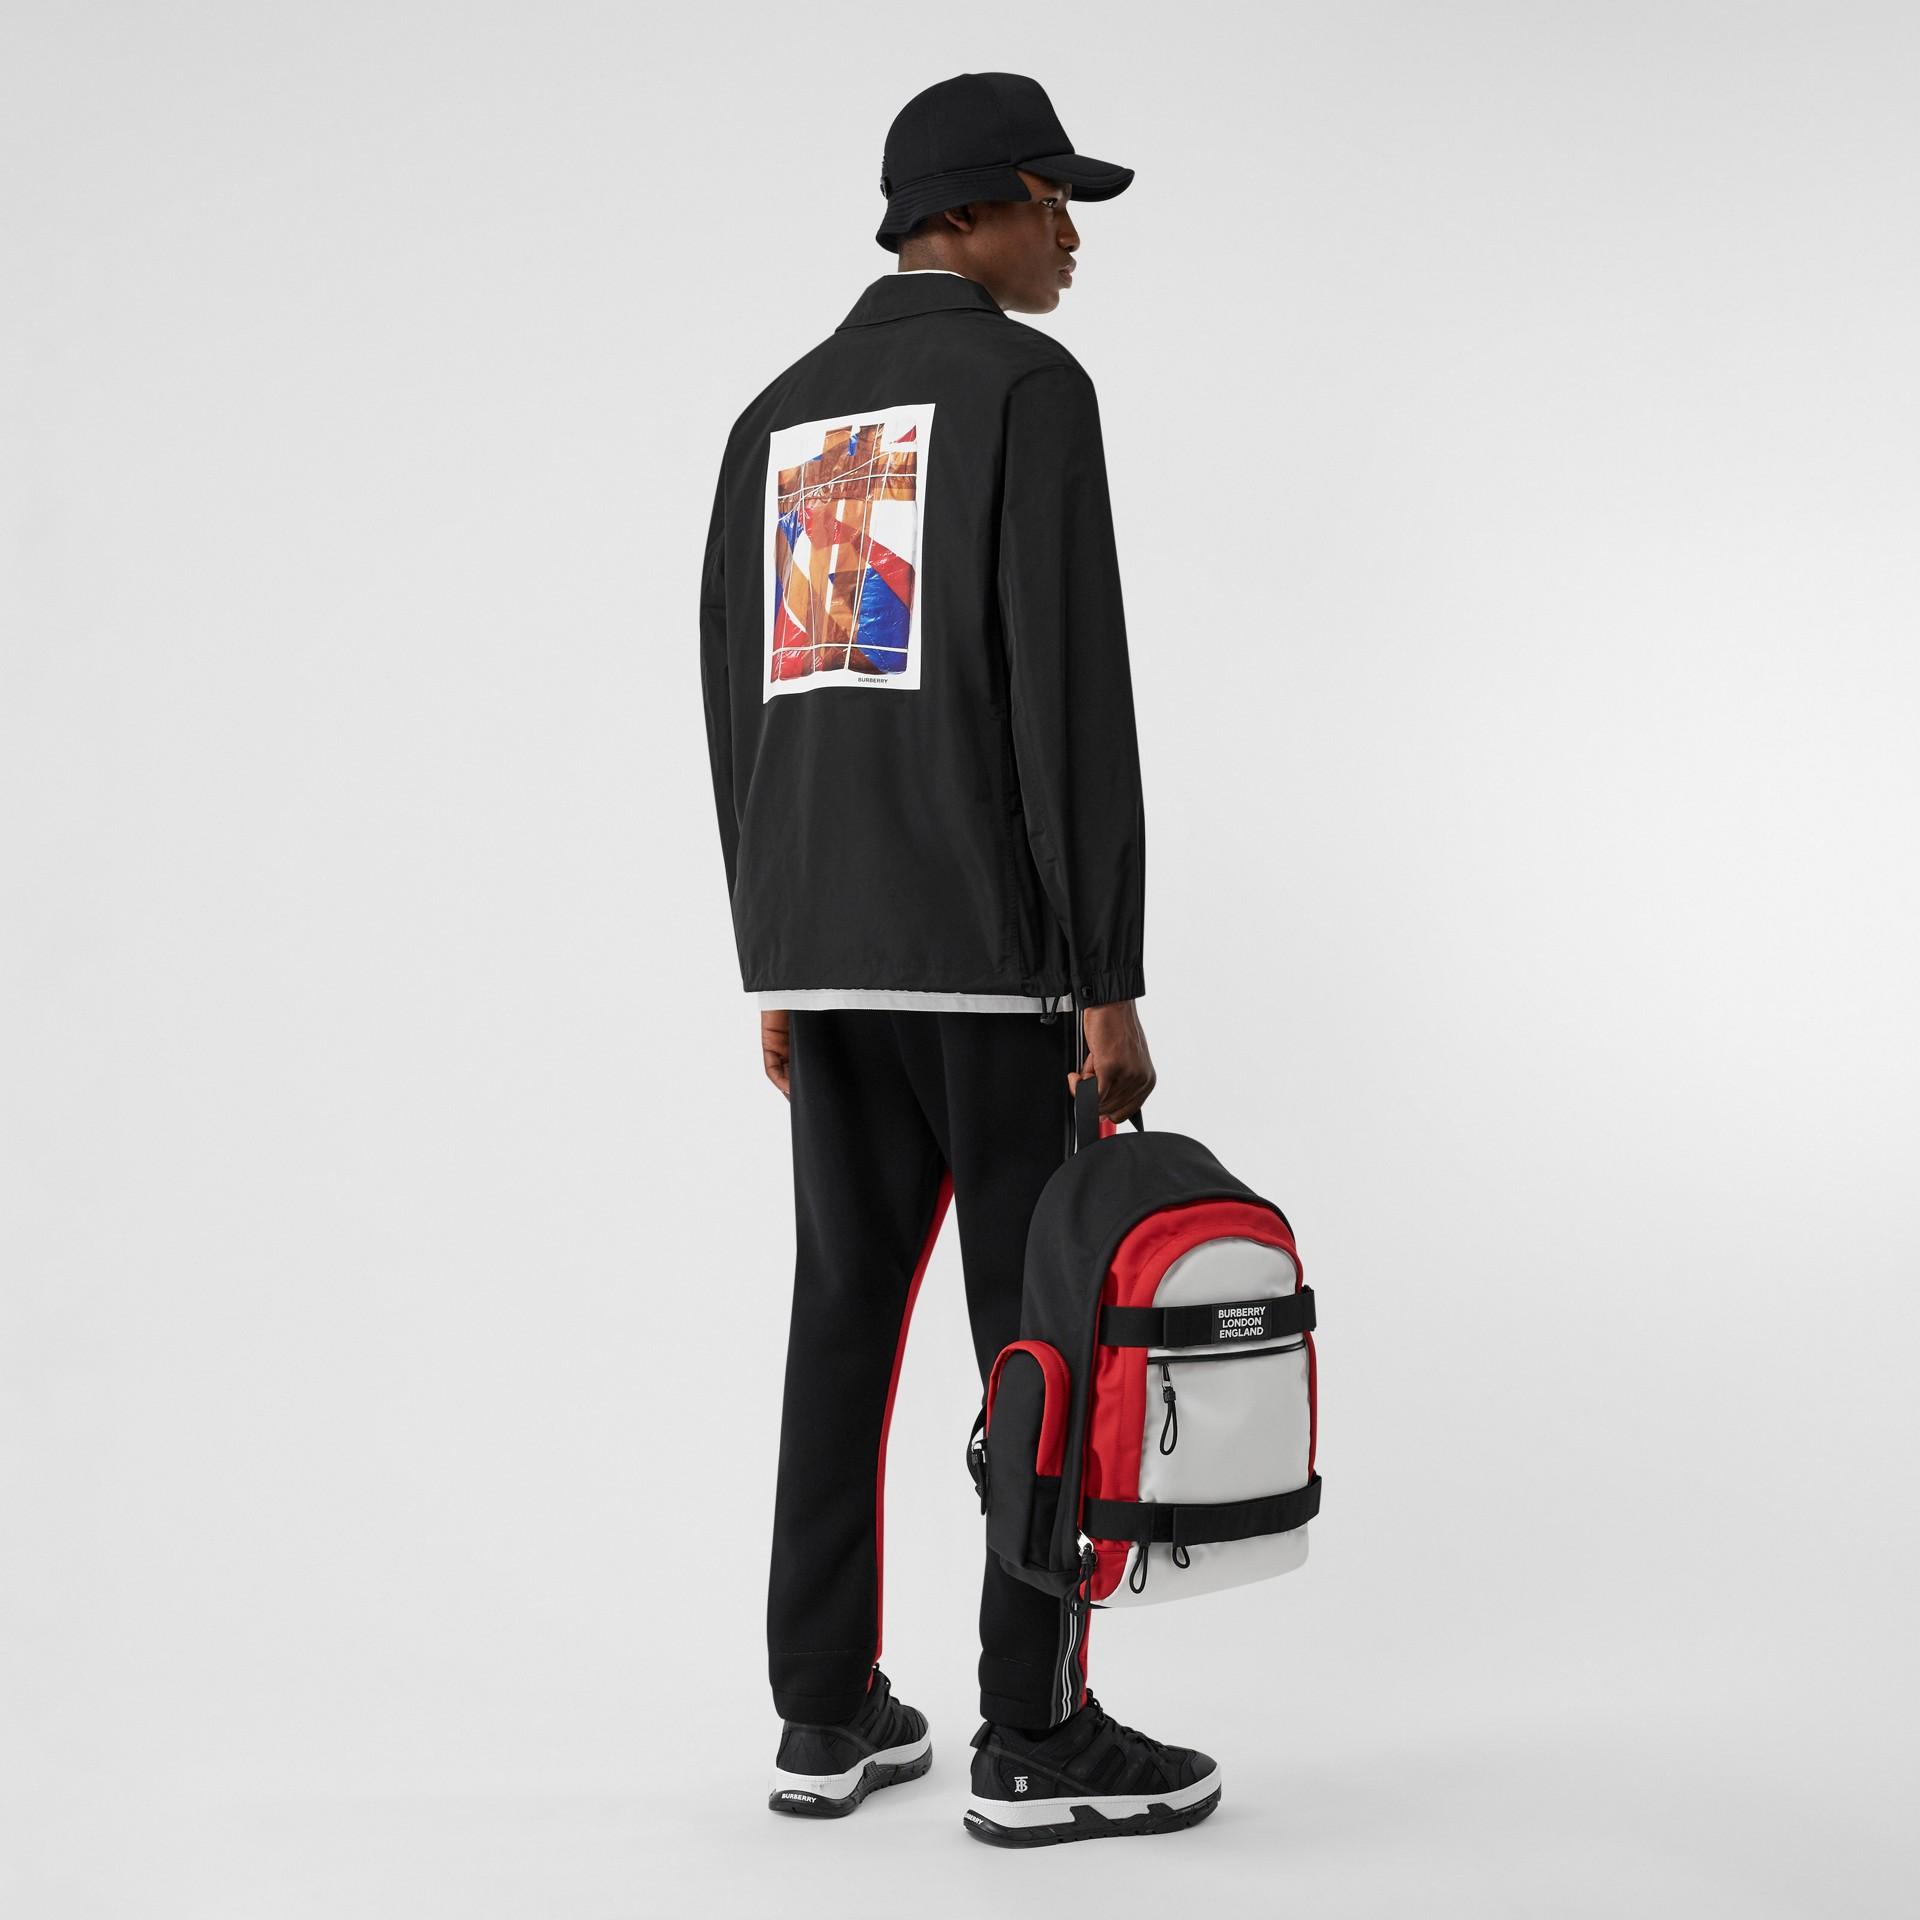 Tape Print Shape-memory Taffeta Jacket in Black - Men | Burberry Hong Kong S.A.R - gallery image 4